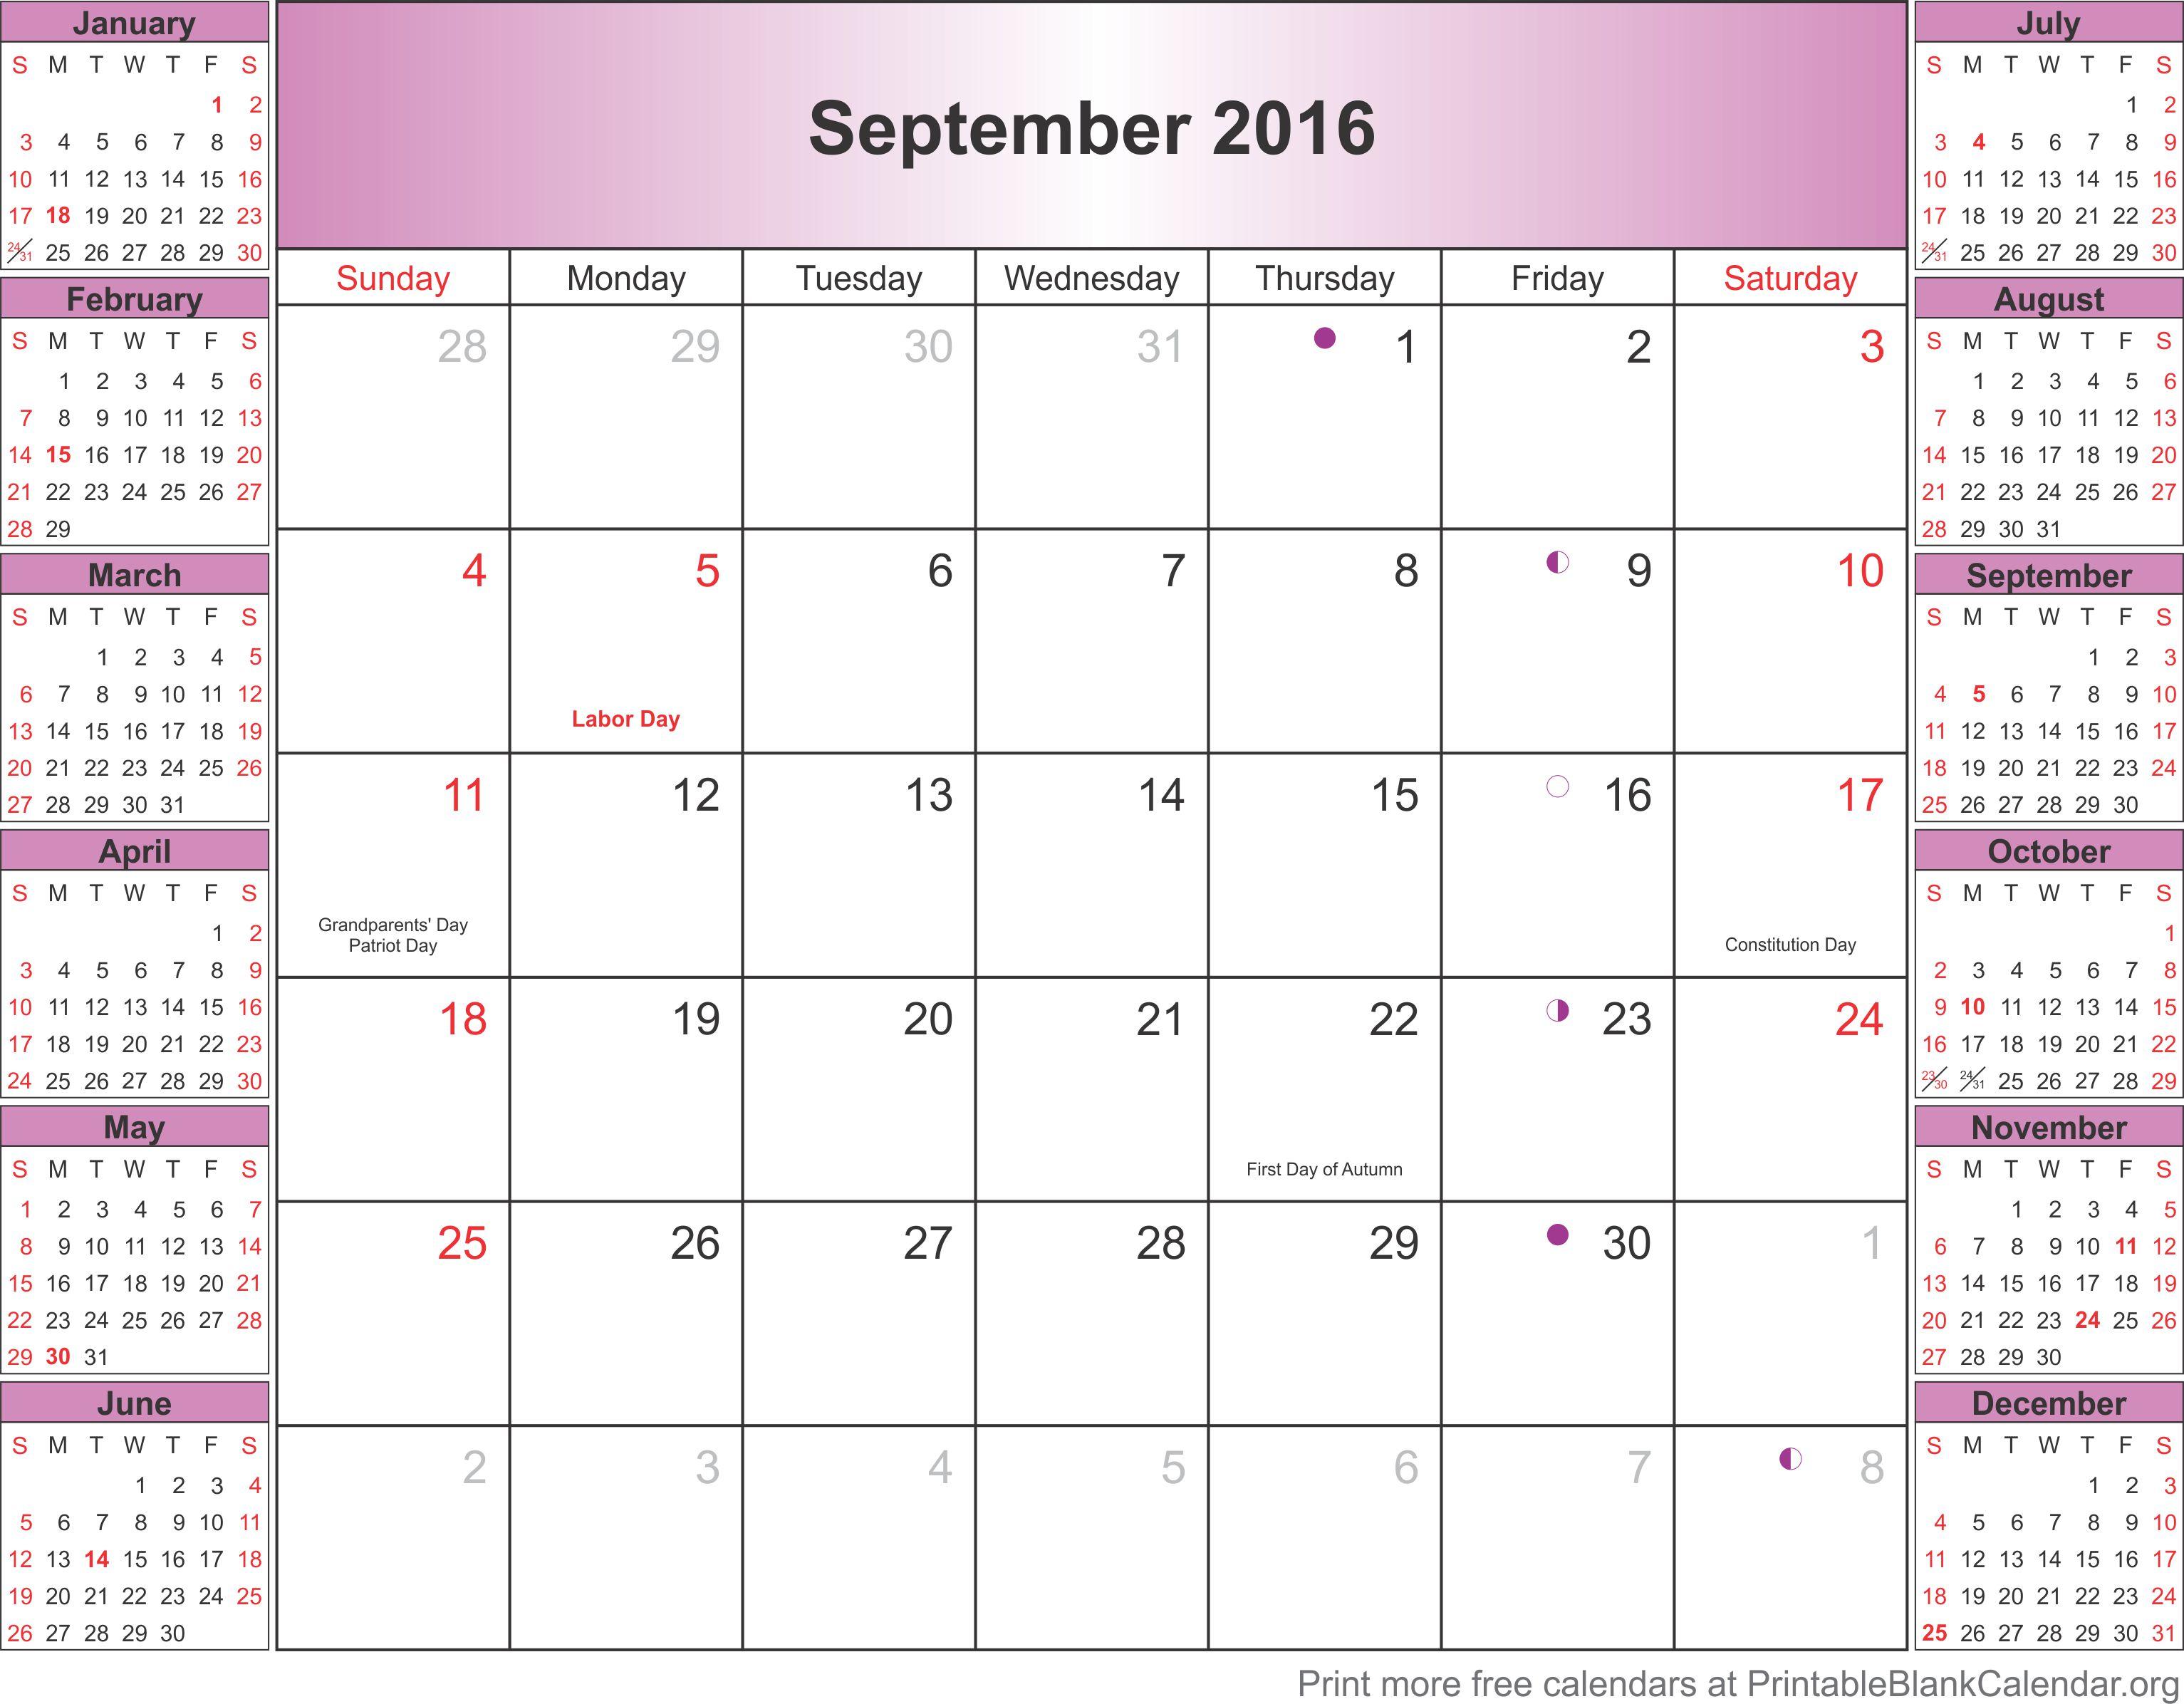 September 2016 blank calendar template - Printable Blank Calendar.org